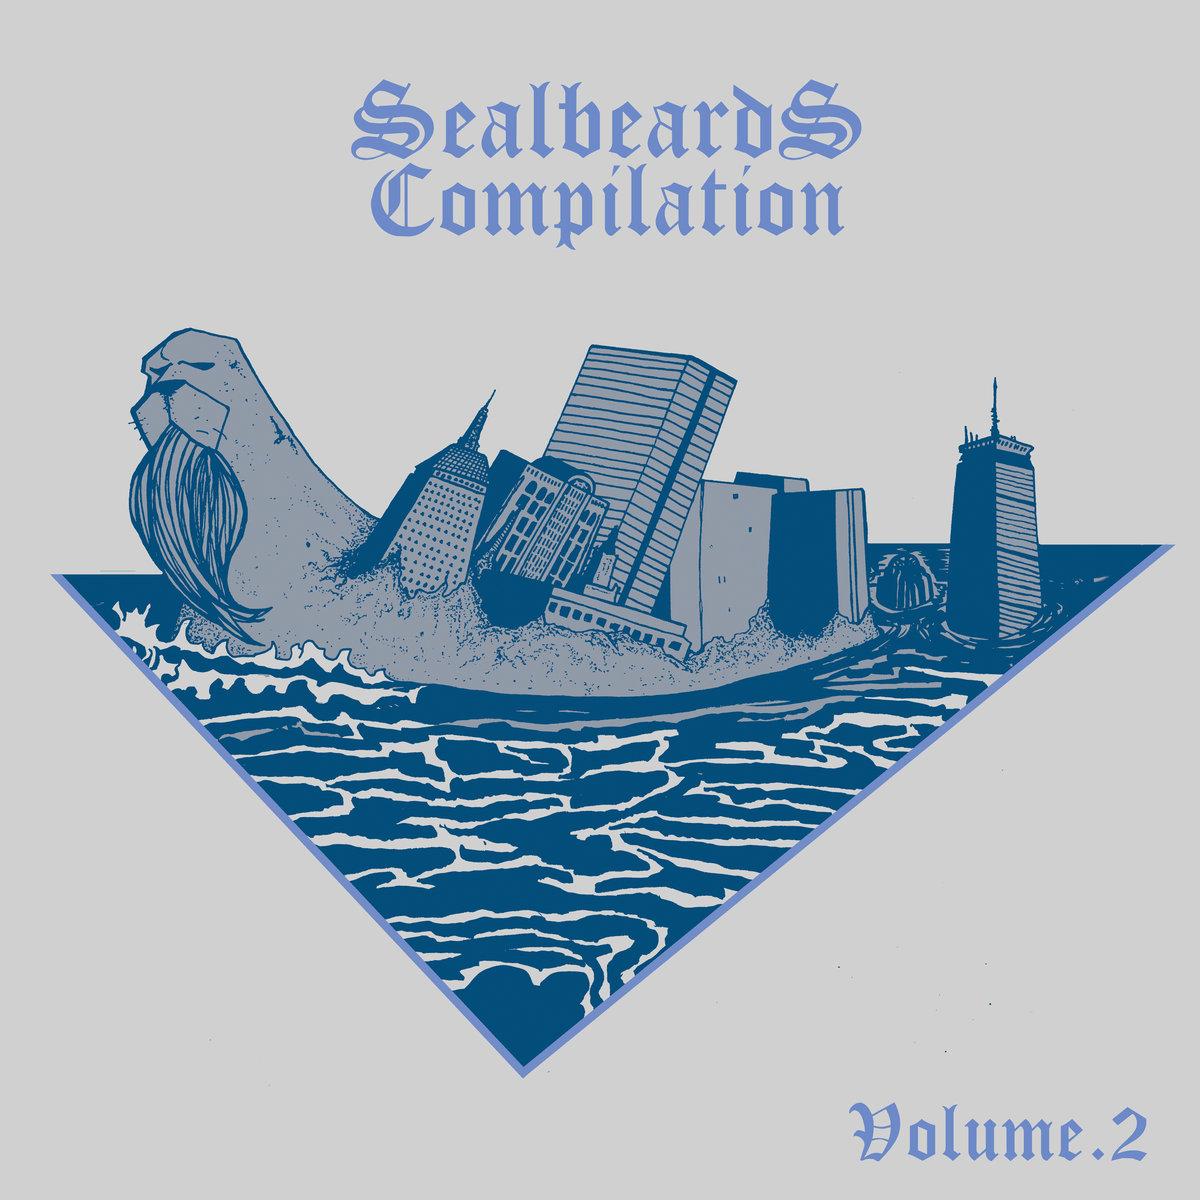 sealbeards-compilation